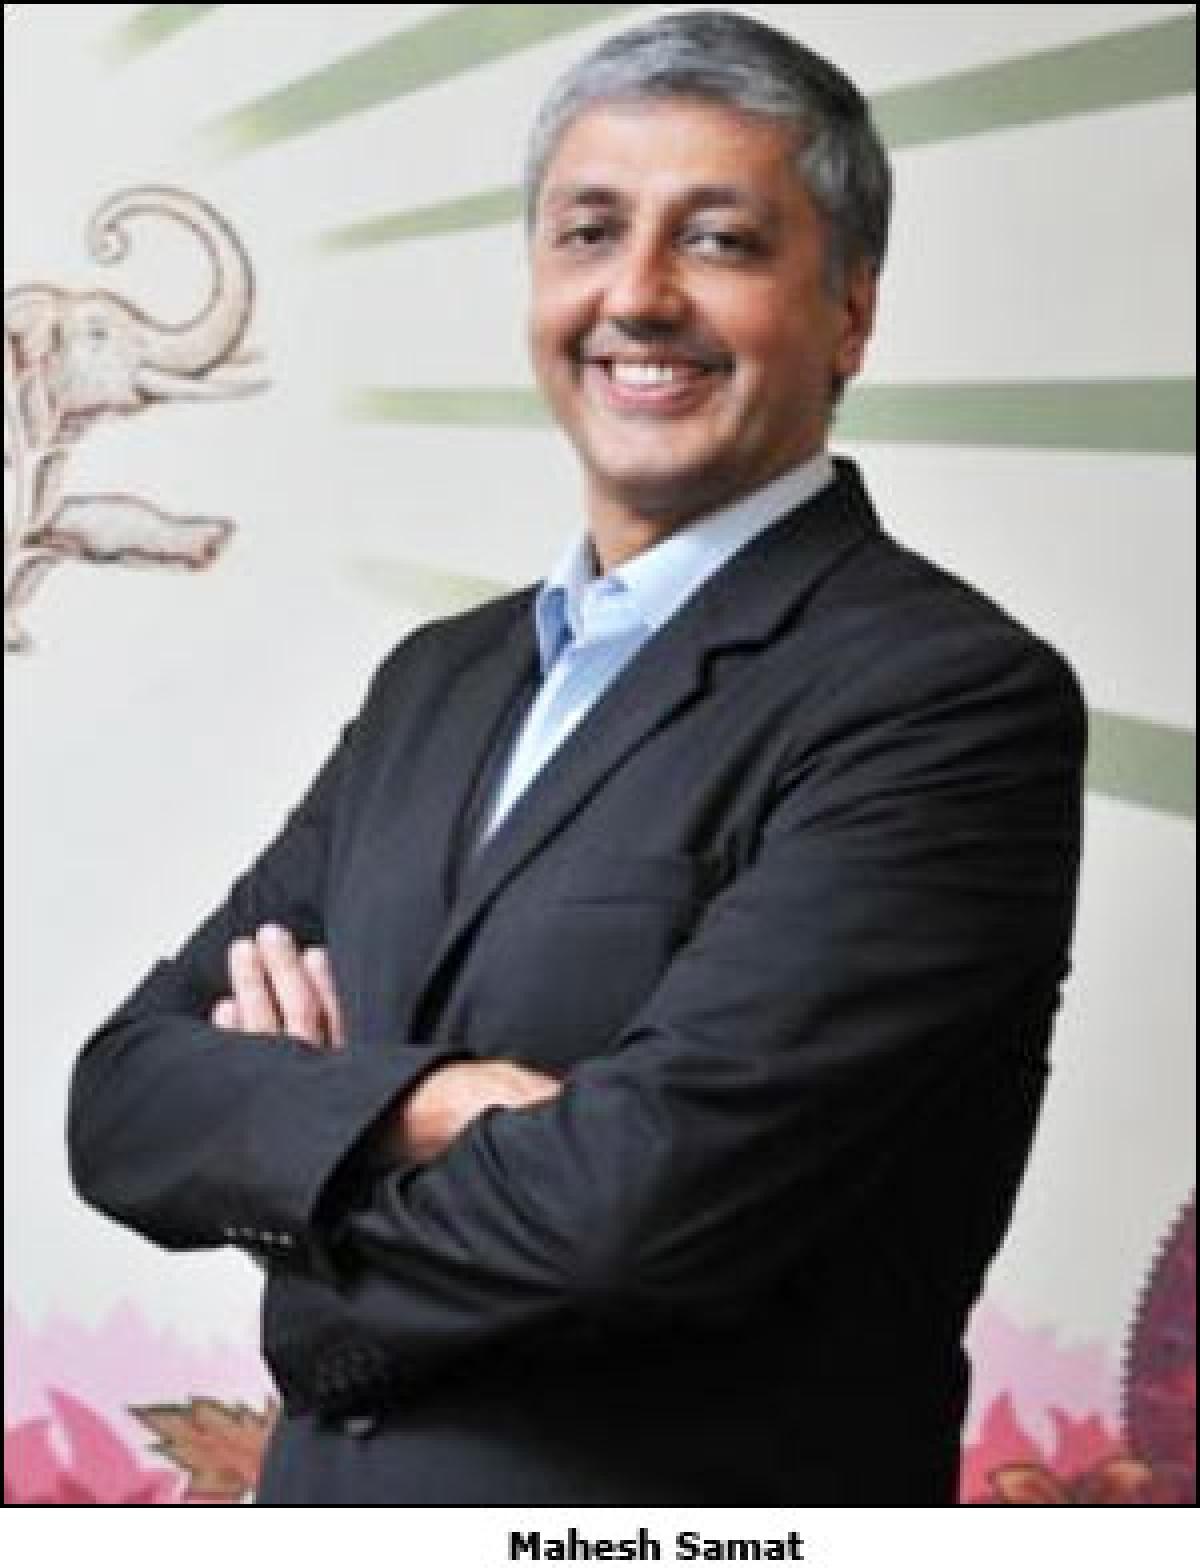 Mahesh Samat's 'Epic' run to begin on November 19